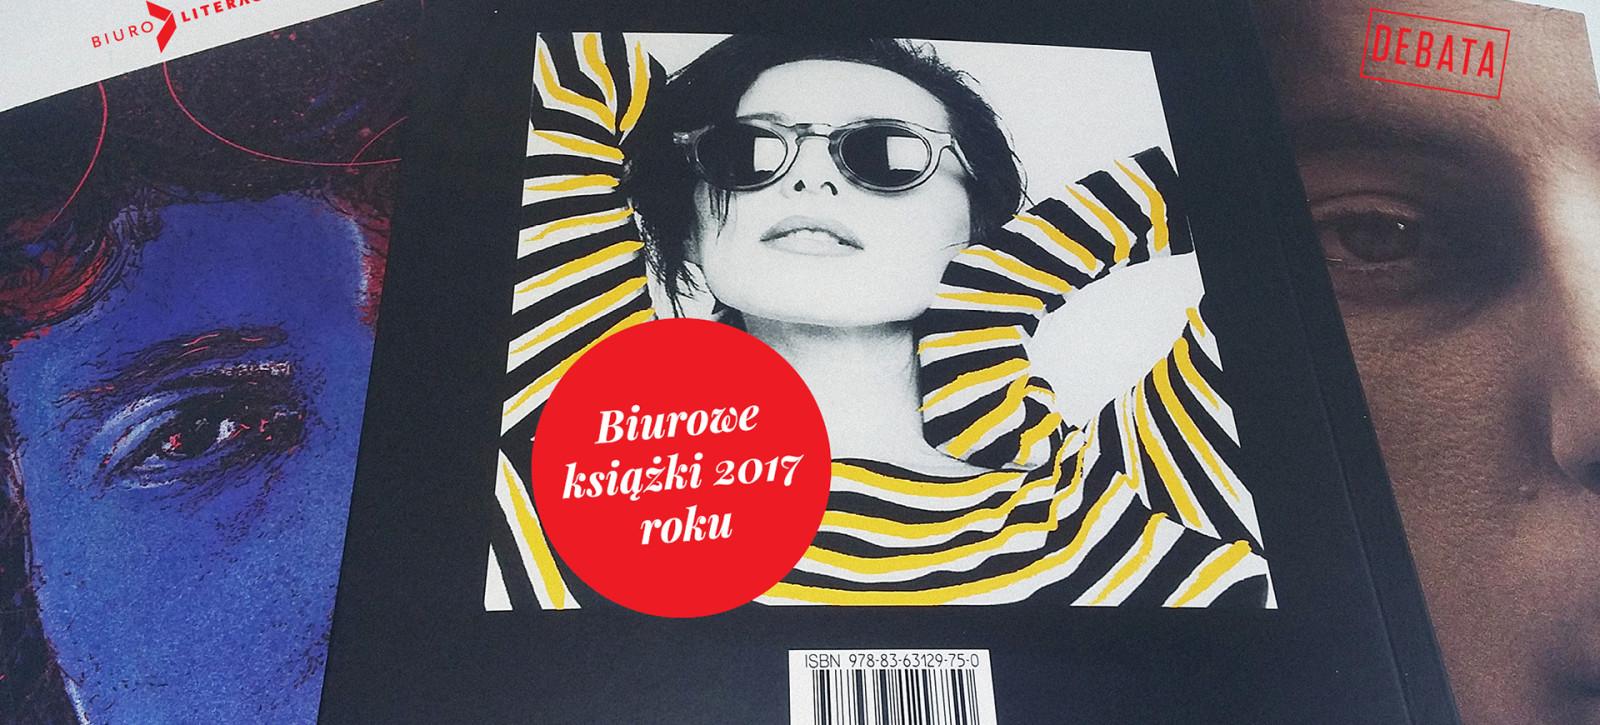 15_DEBATY__Biurowe_książki_roku__Maria_PASTWA